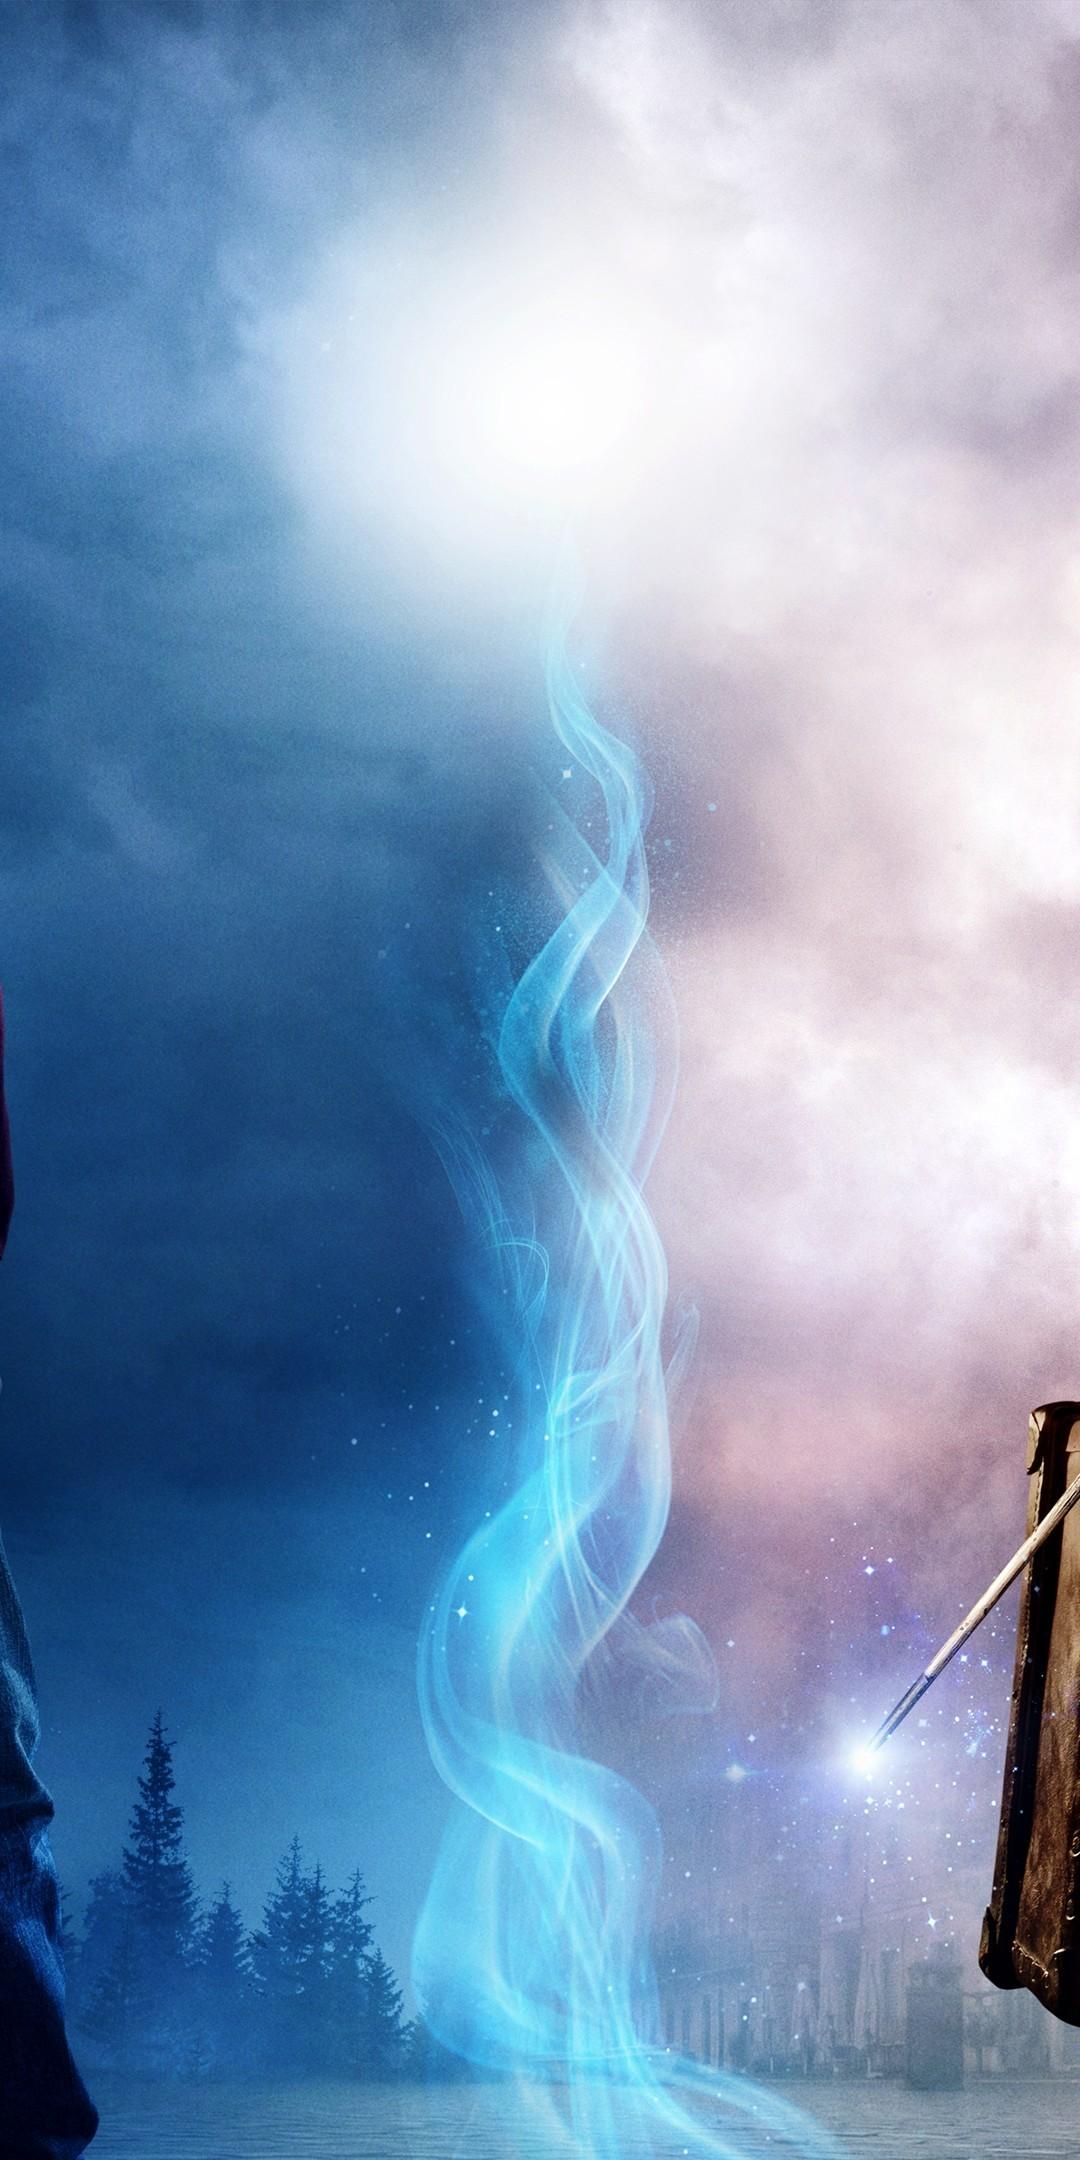 The Crimes Of Grindelwald, Harry Potter - Harry Potter Wallpaper 4k - HD Wallpaper